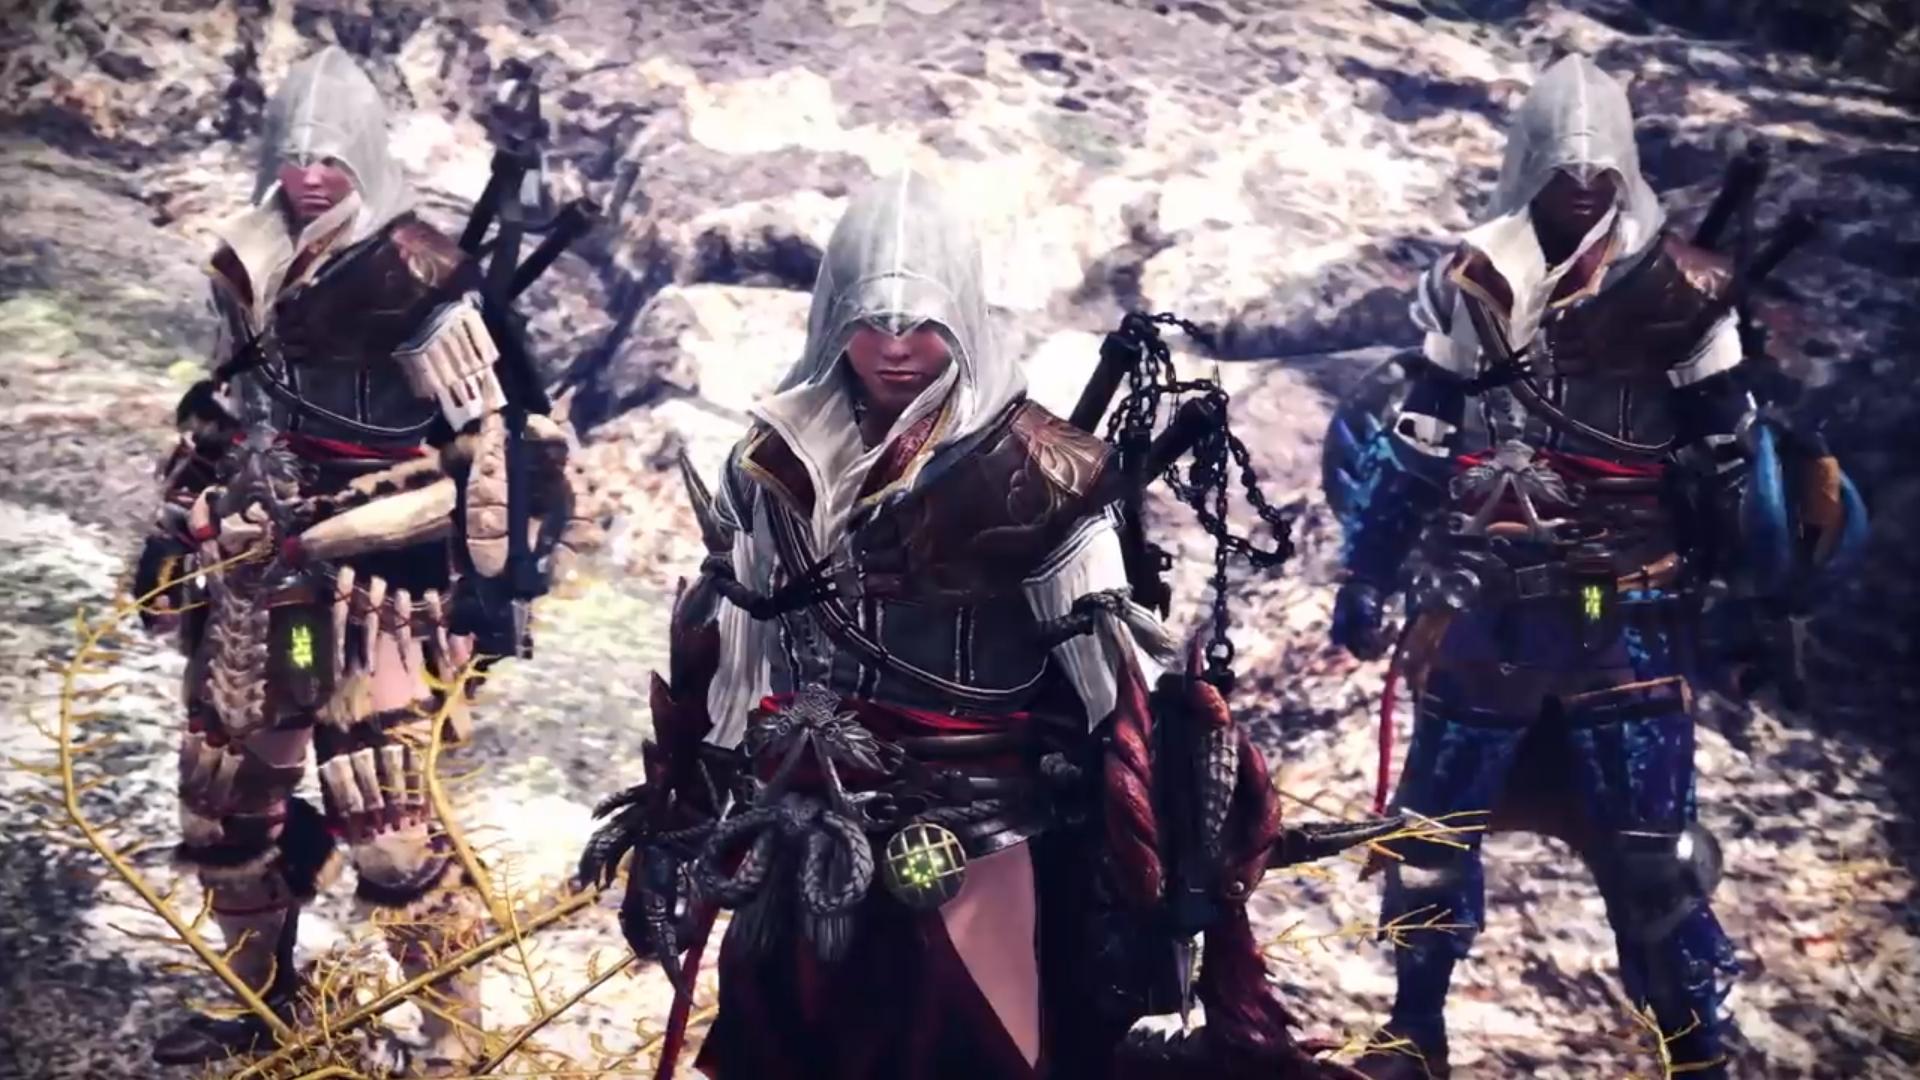 Monster Hunter: World, Assassin's Creed